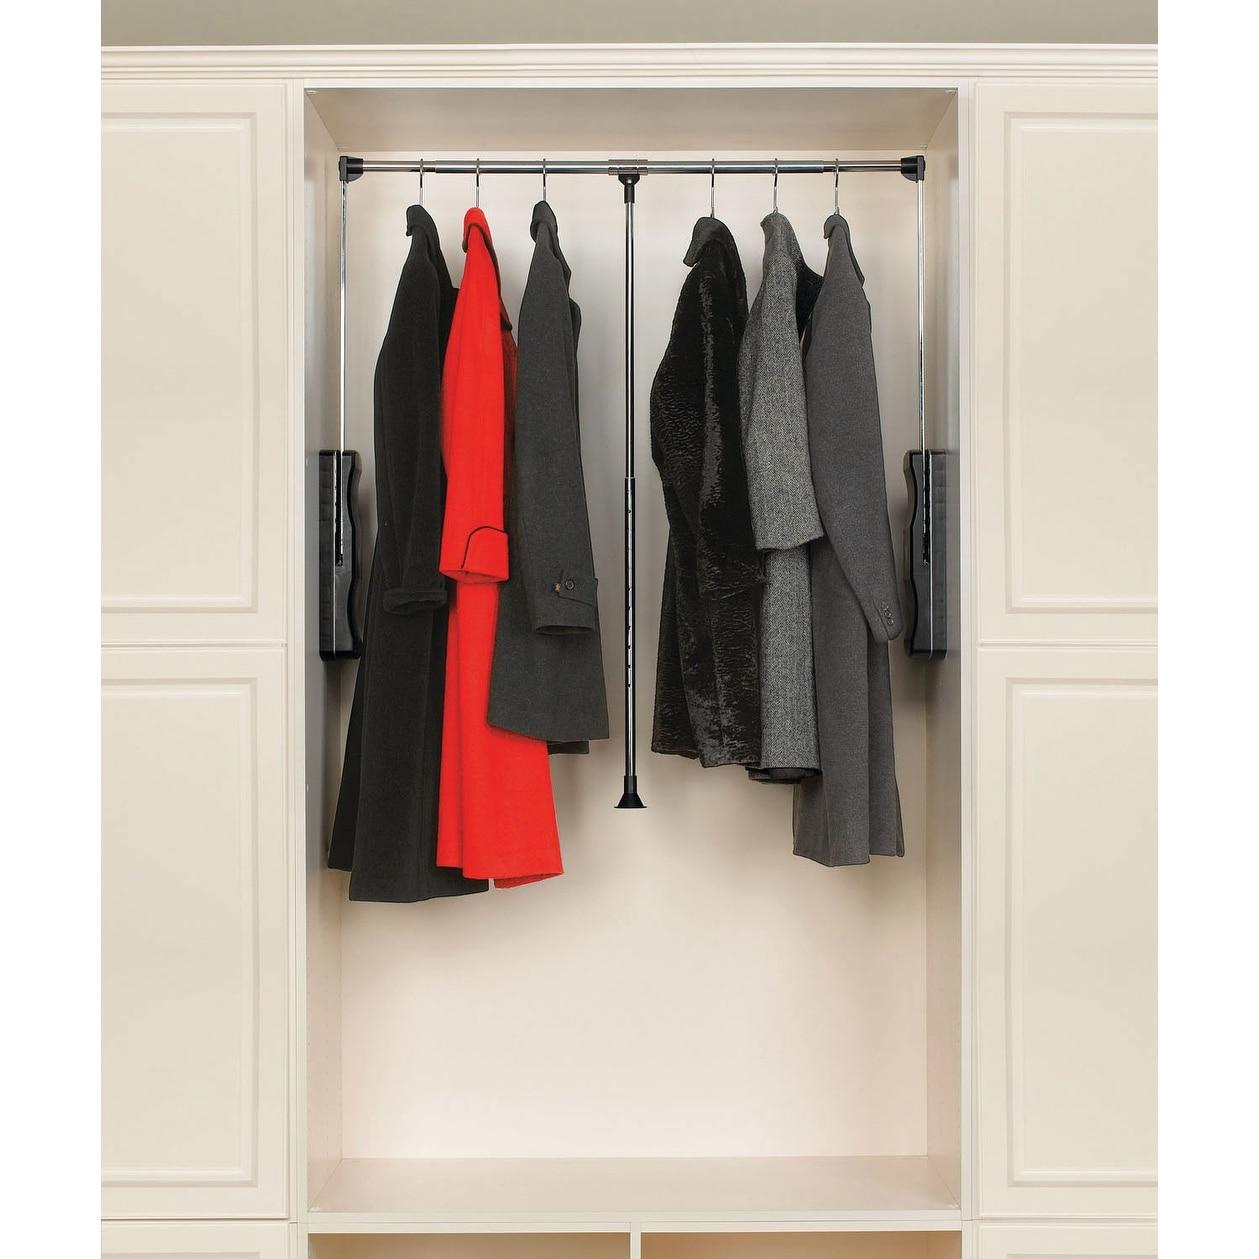 Shop Rev A Shelf Cpdr 3548 Cpdr Series 35 48 Pull Down Closet